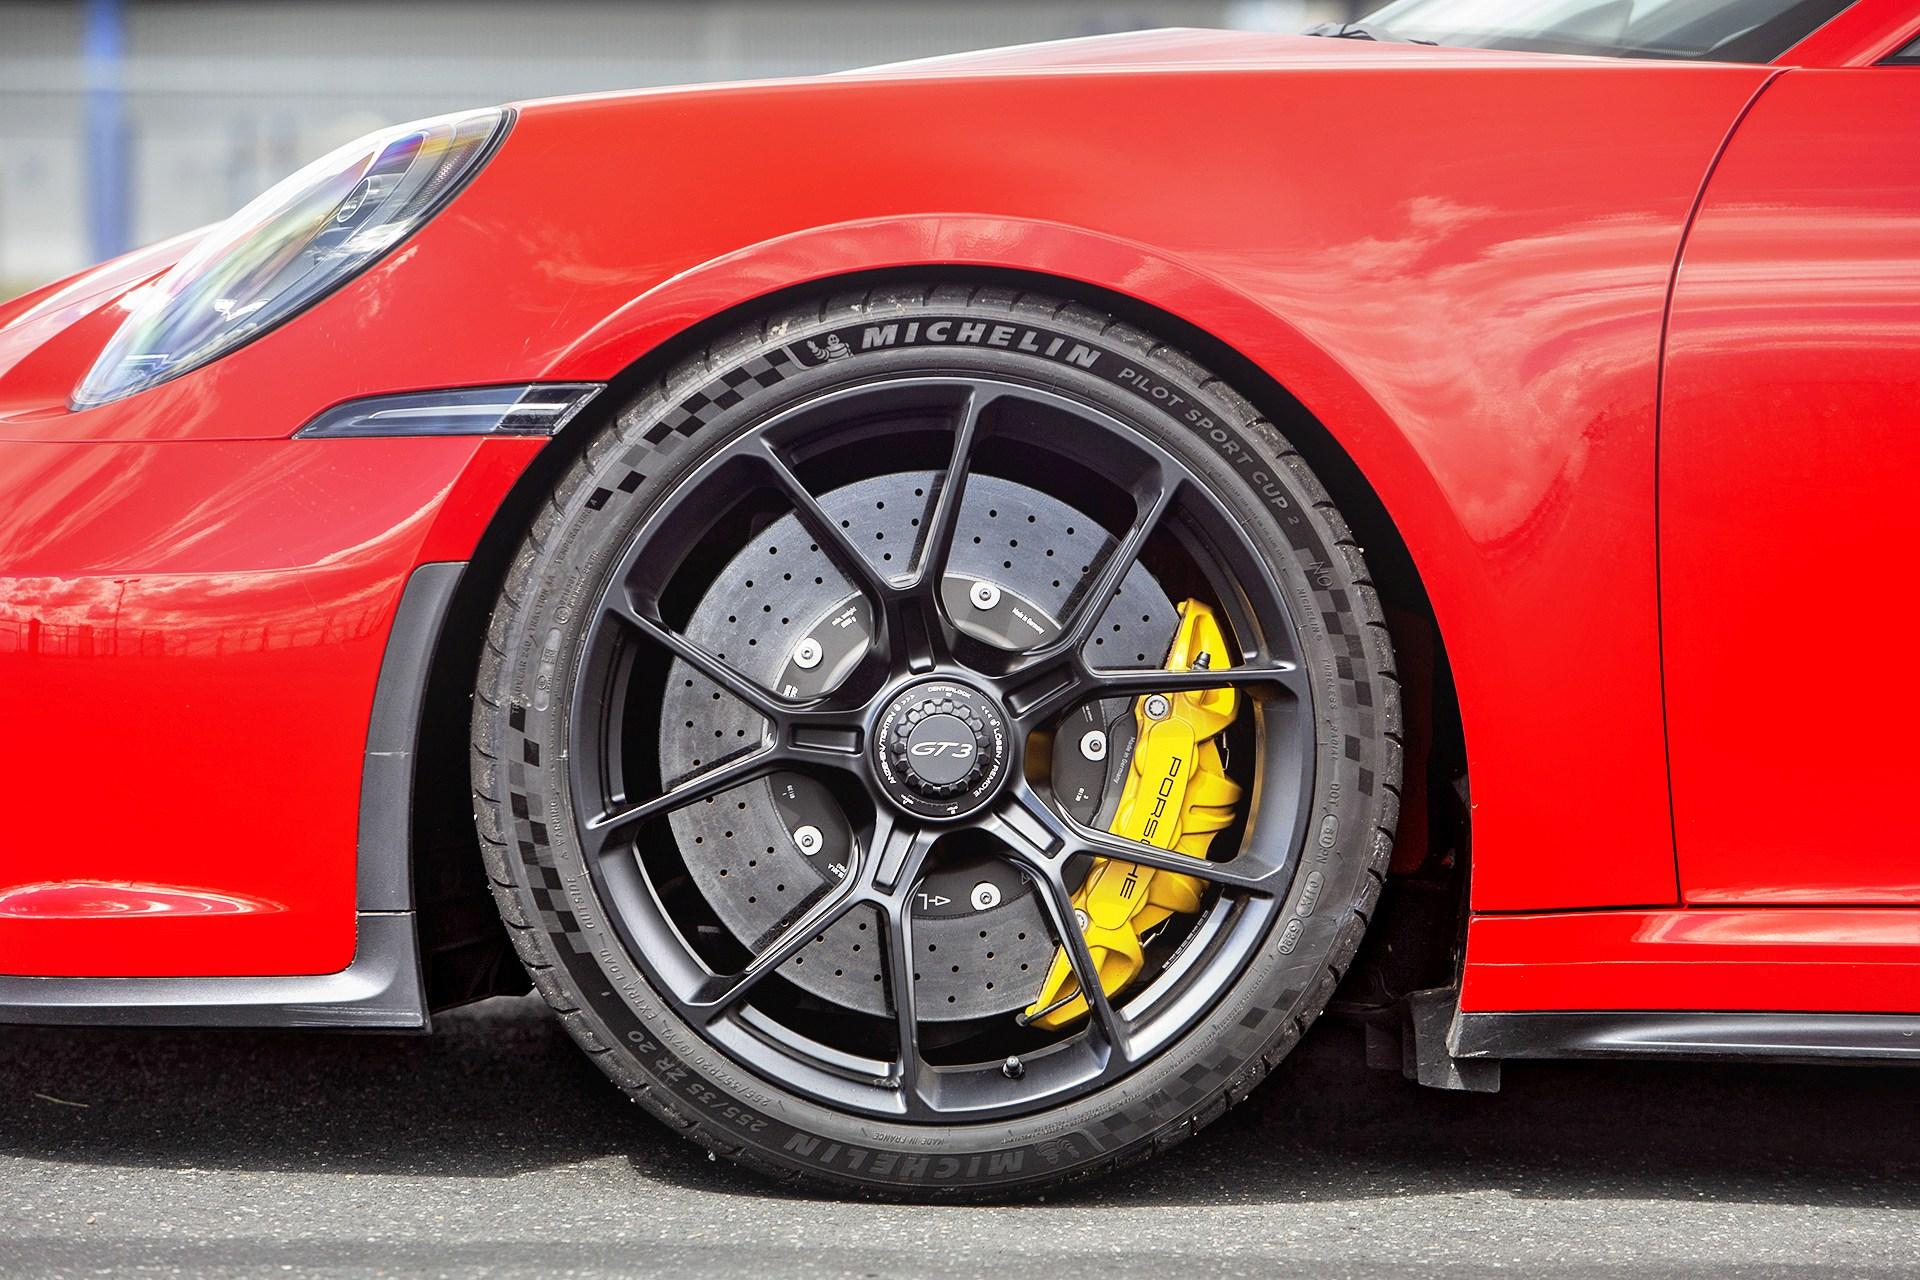 Porsche 911 GT3 - tarcza hamulcowa